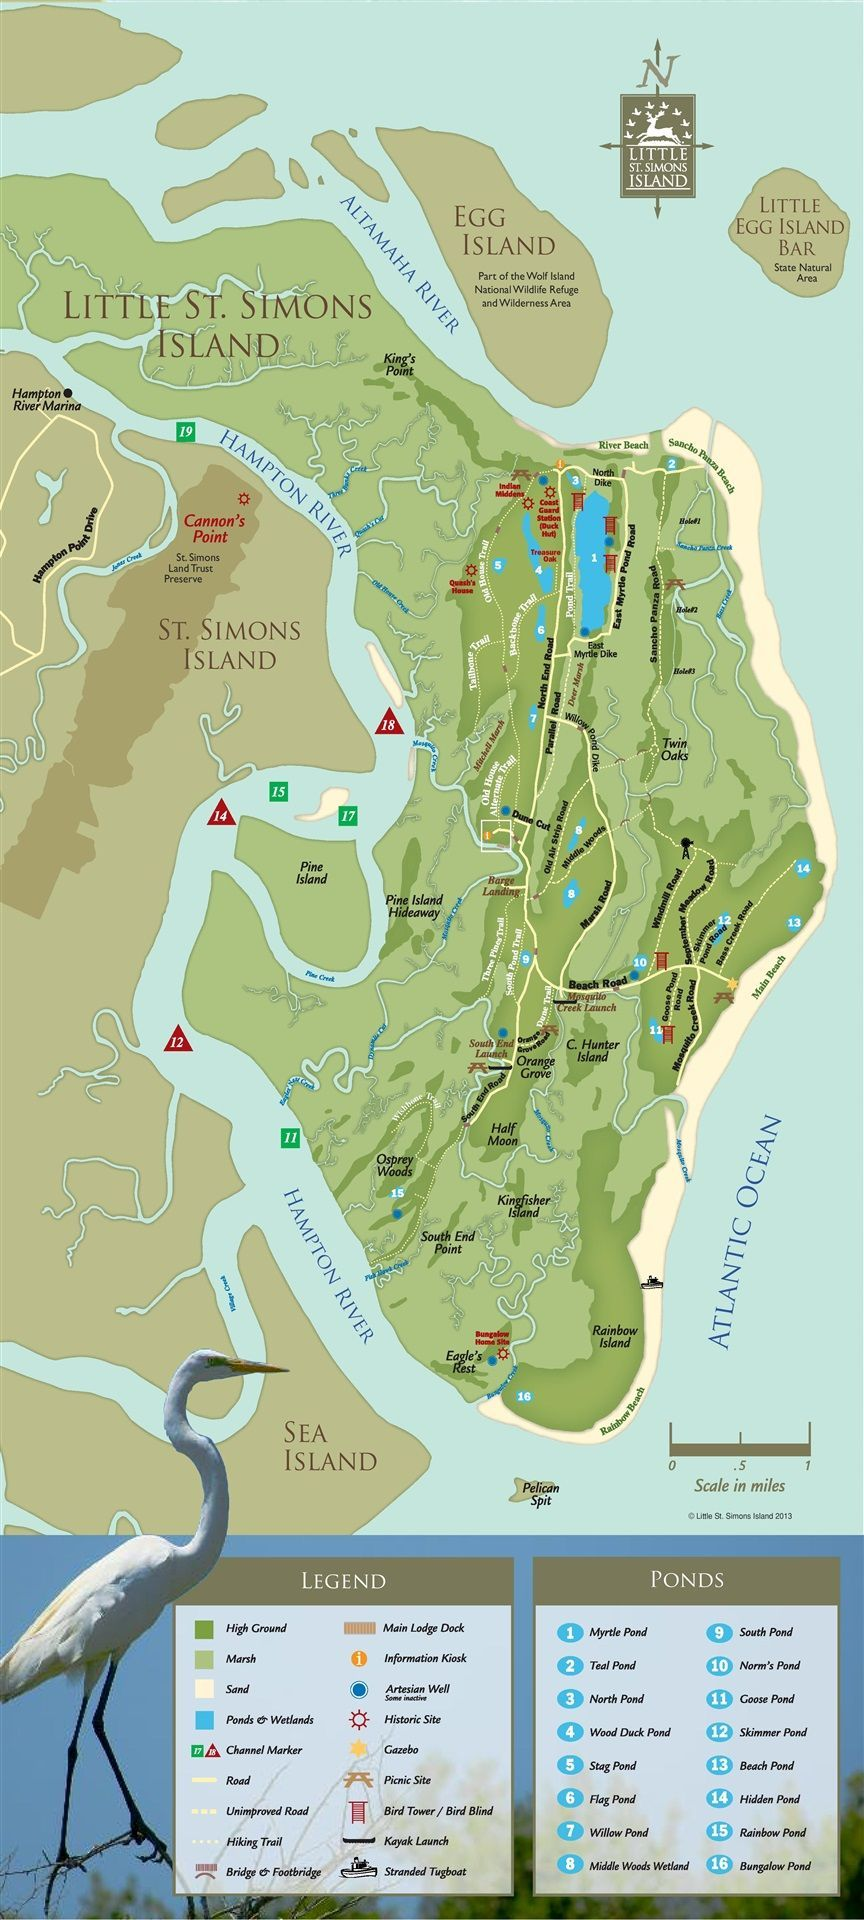 The Lodge On Little St Simons Island >> Experience. Explore. Discover - The Lodge on Little St. Simons Island - St. Simons Island ...